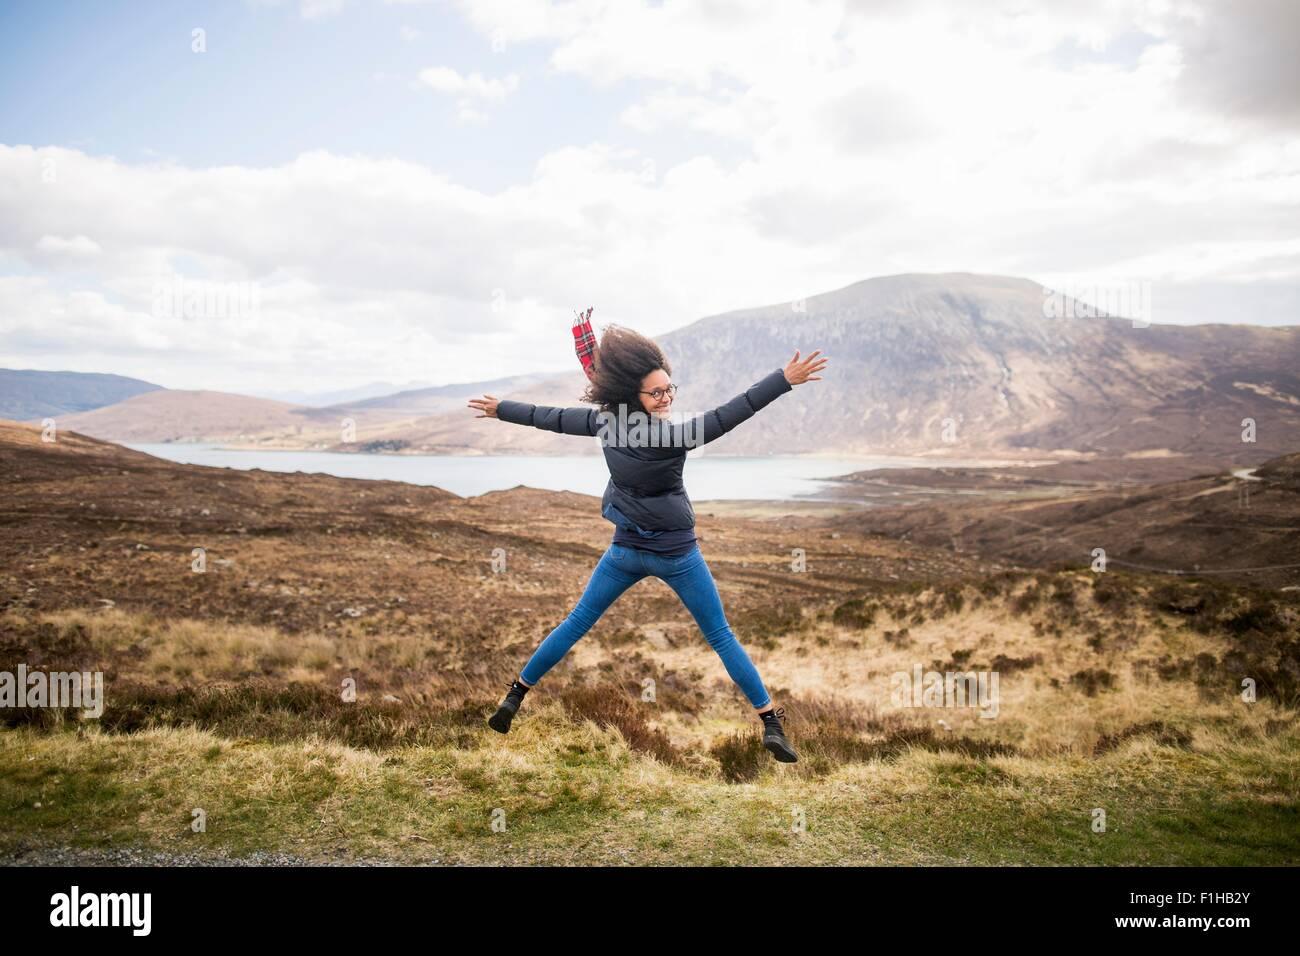 Mitte Erwachsene Frau in Bergen tun Sterne springen, Isle Of Skye, Hebriden, Schottland Stockbild